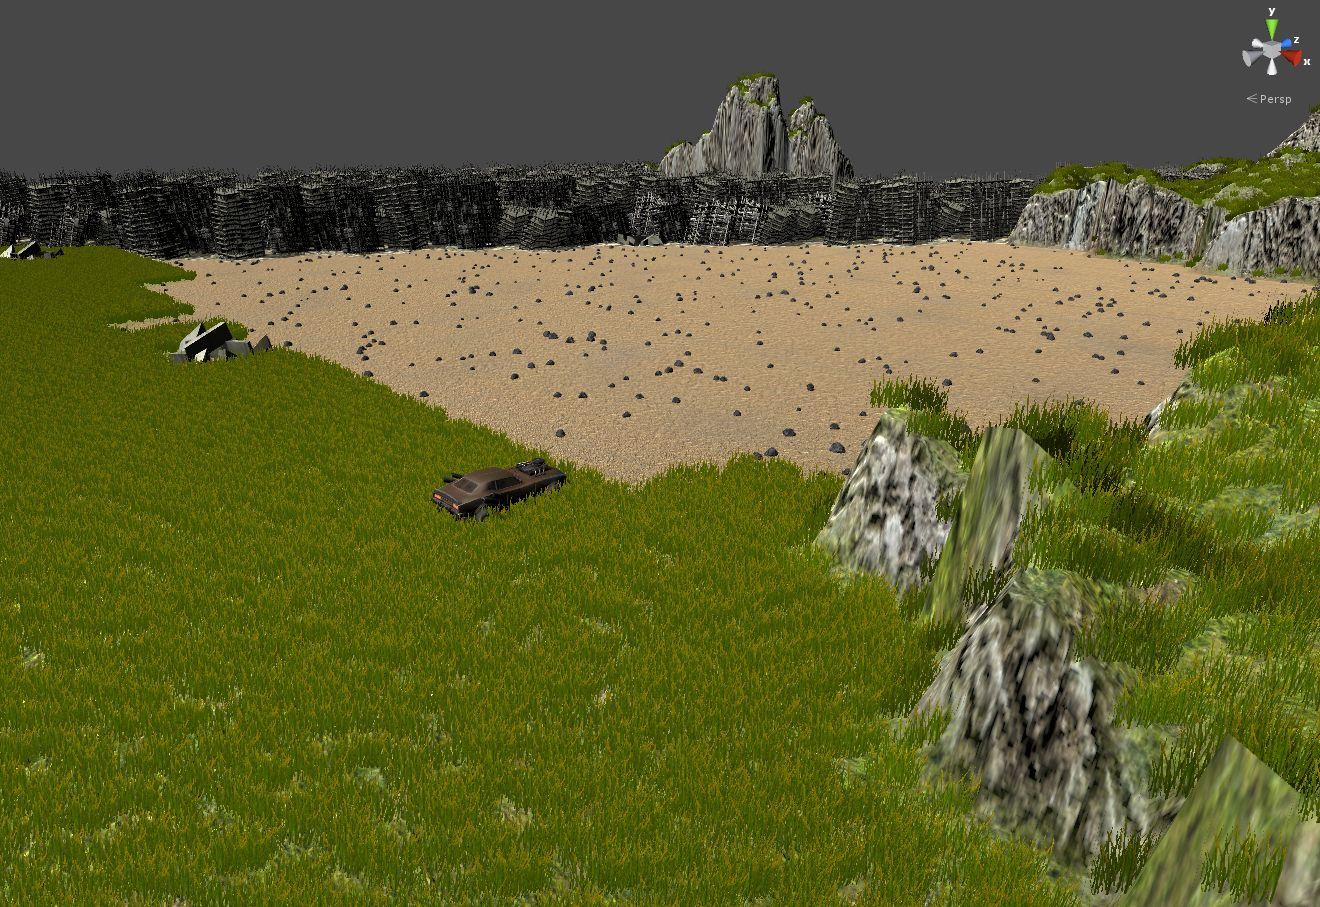 autofire_terrain_details_2